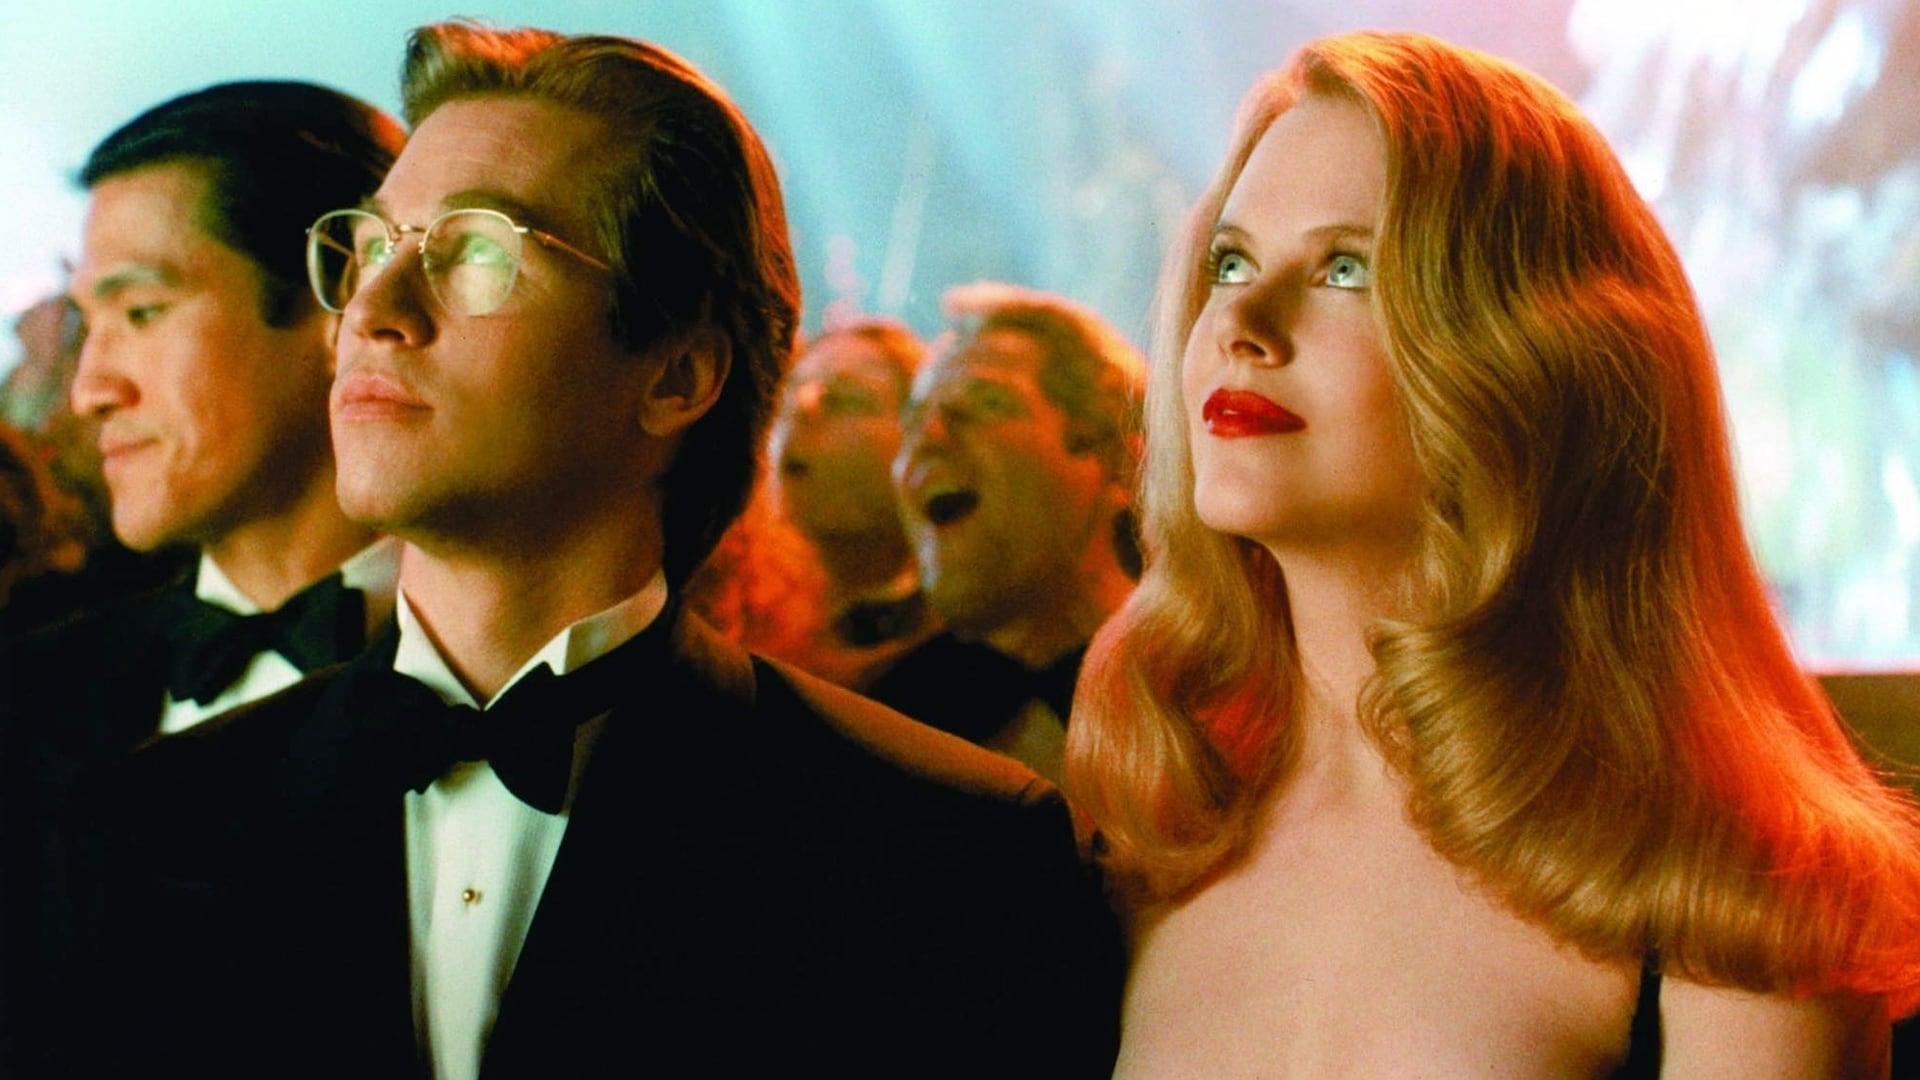 Bruce Wayne (Val Kilmer) and Dr Chase Meridian (Nicole Kidman) in Batman Forever (1995)